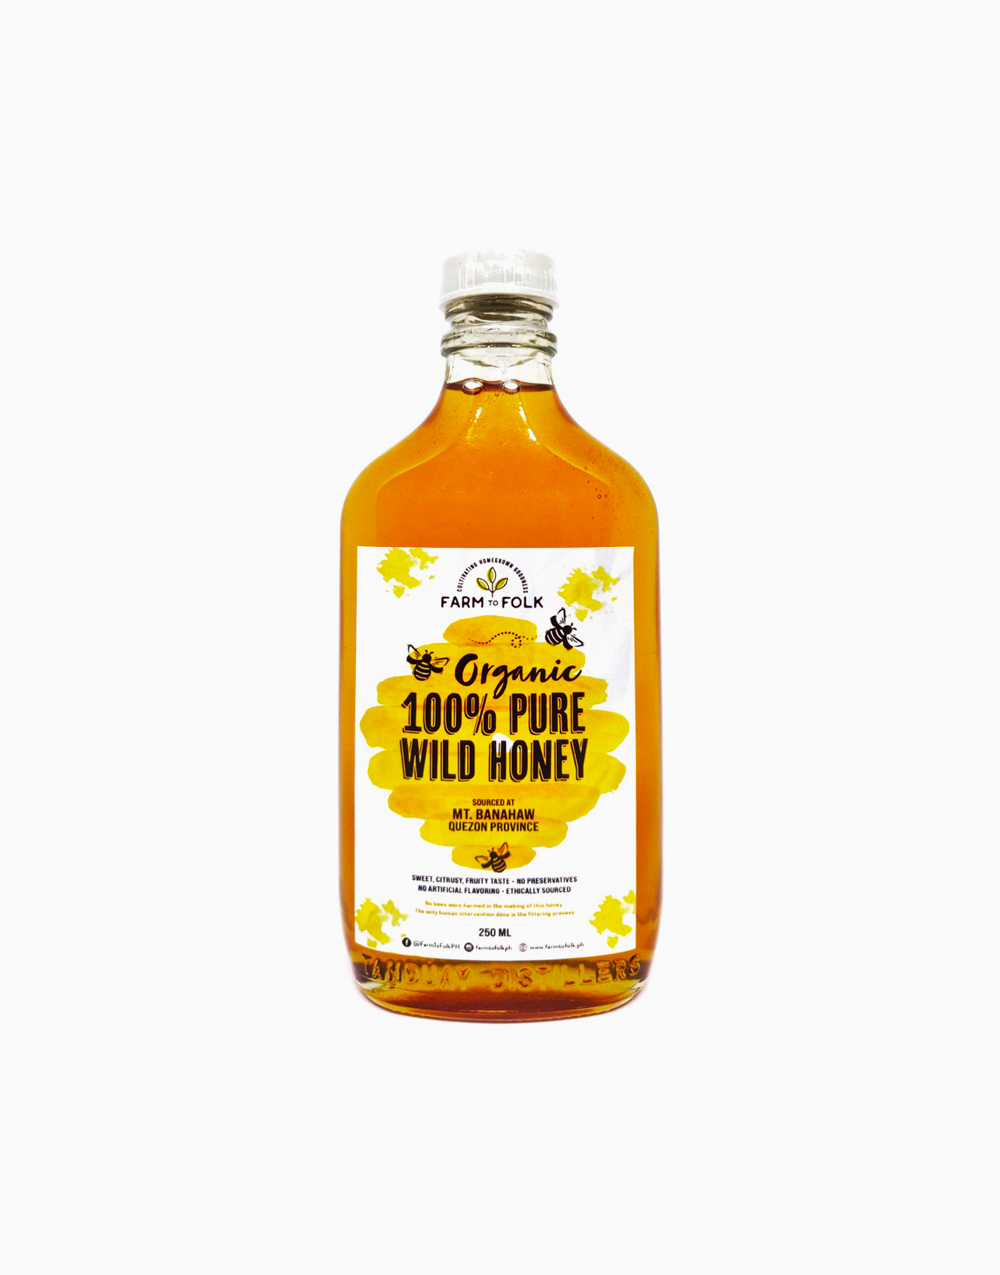 Organic 100% Pure Wild Honey (250ml) by Farm to Folk